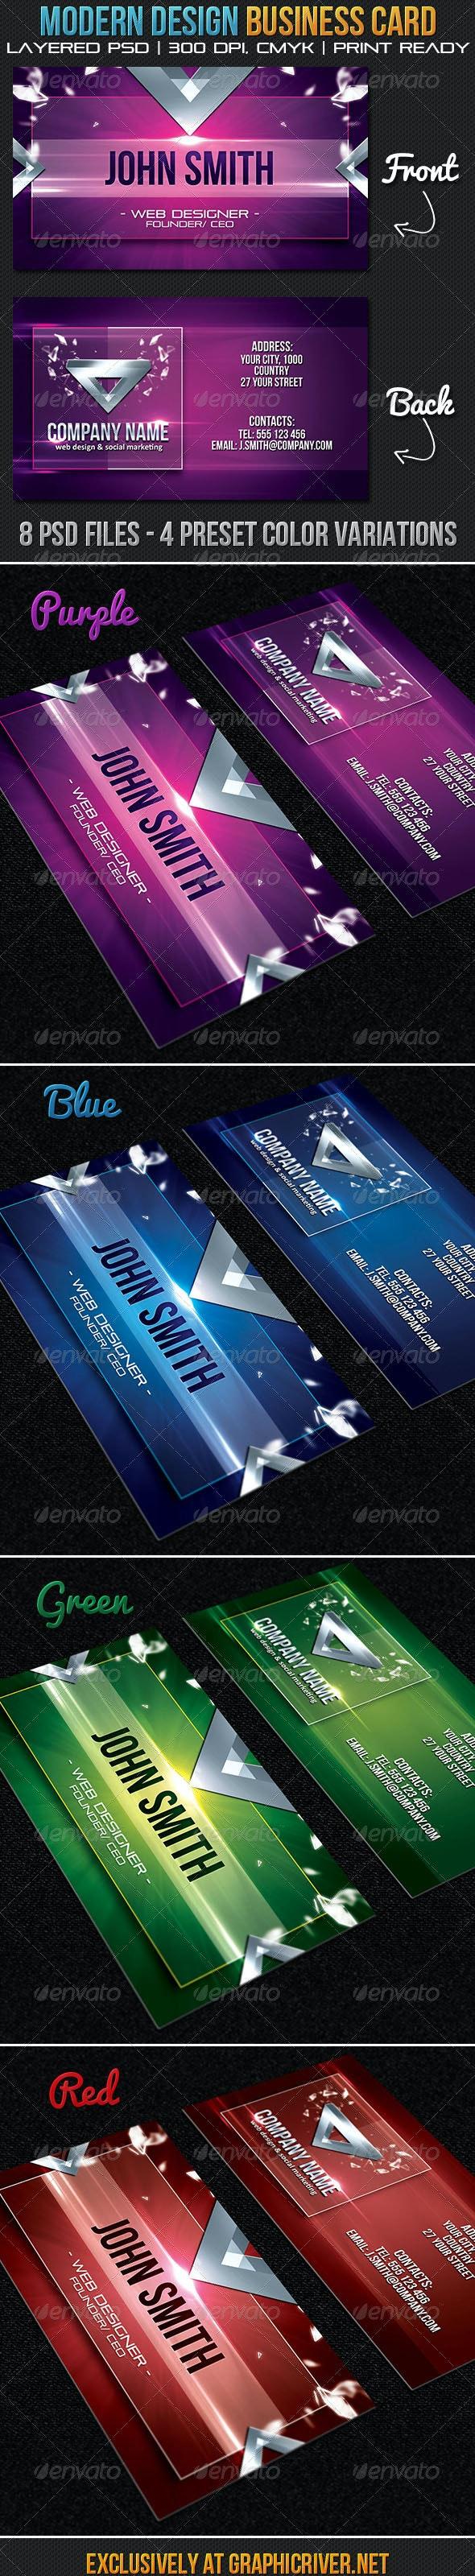 Modern Design Business Card - Creative Business Cards